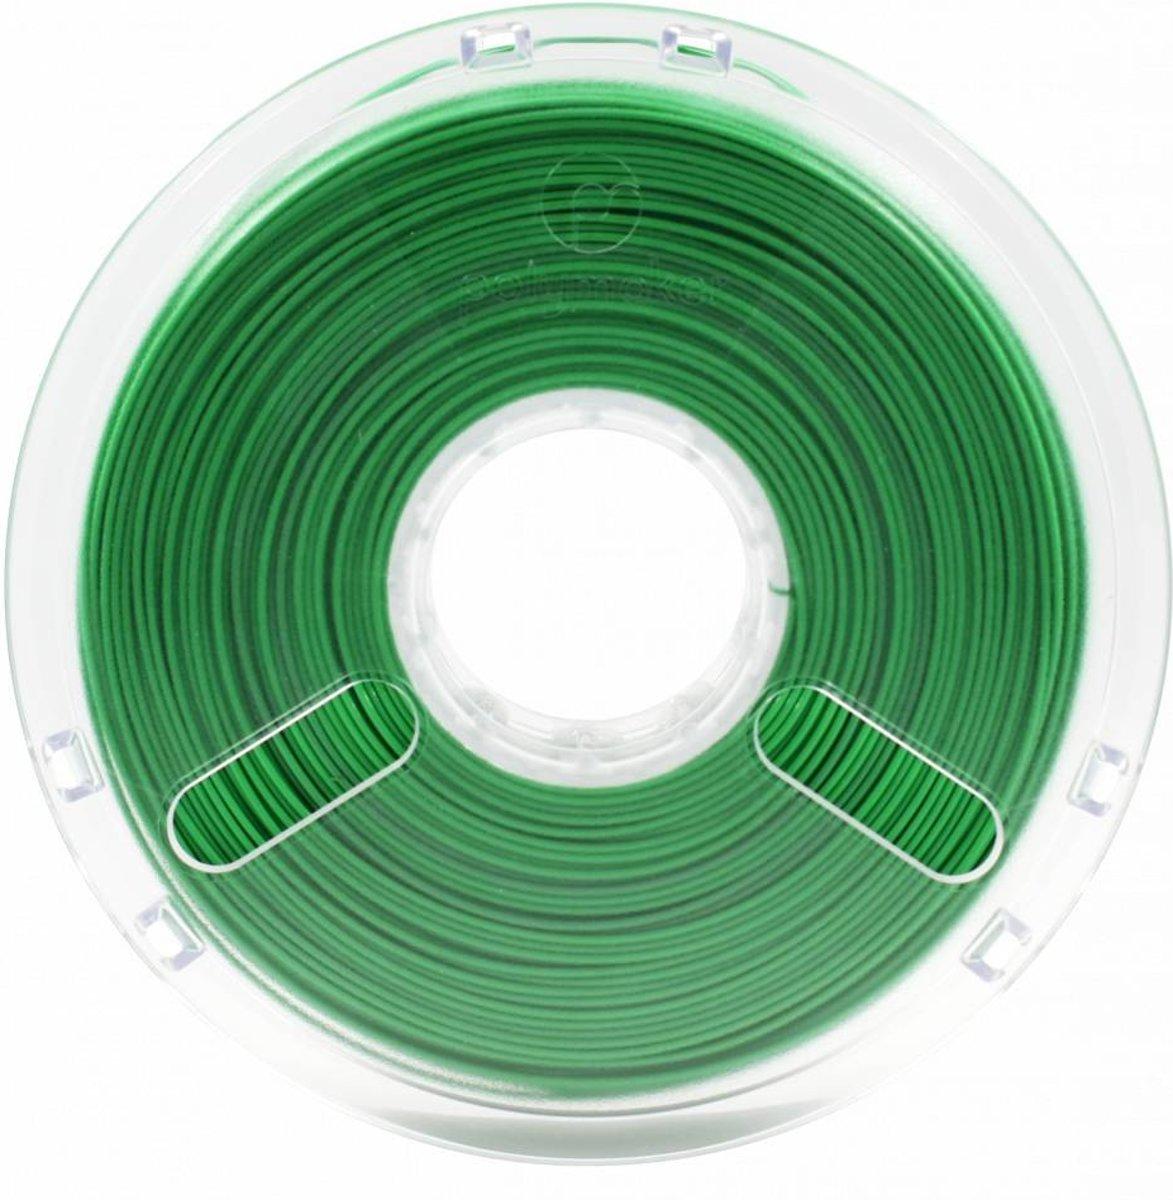 Polymaker Filament voor 3D-printer PolyMax PLA Jam Free Technology 1.75 mm 0.75 kg - True Green